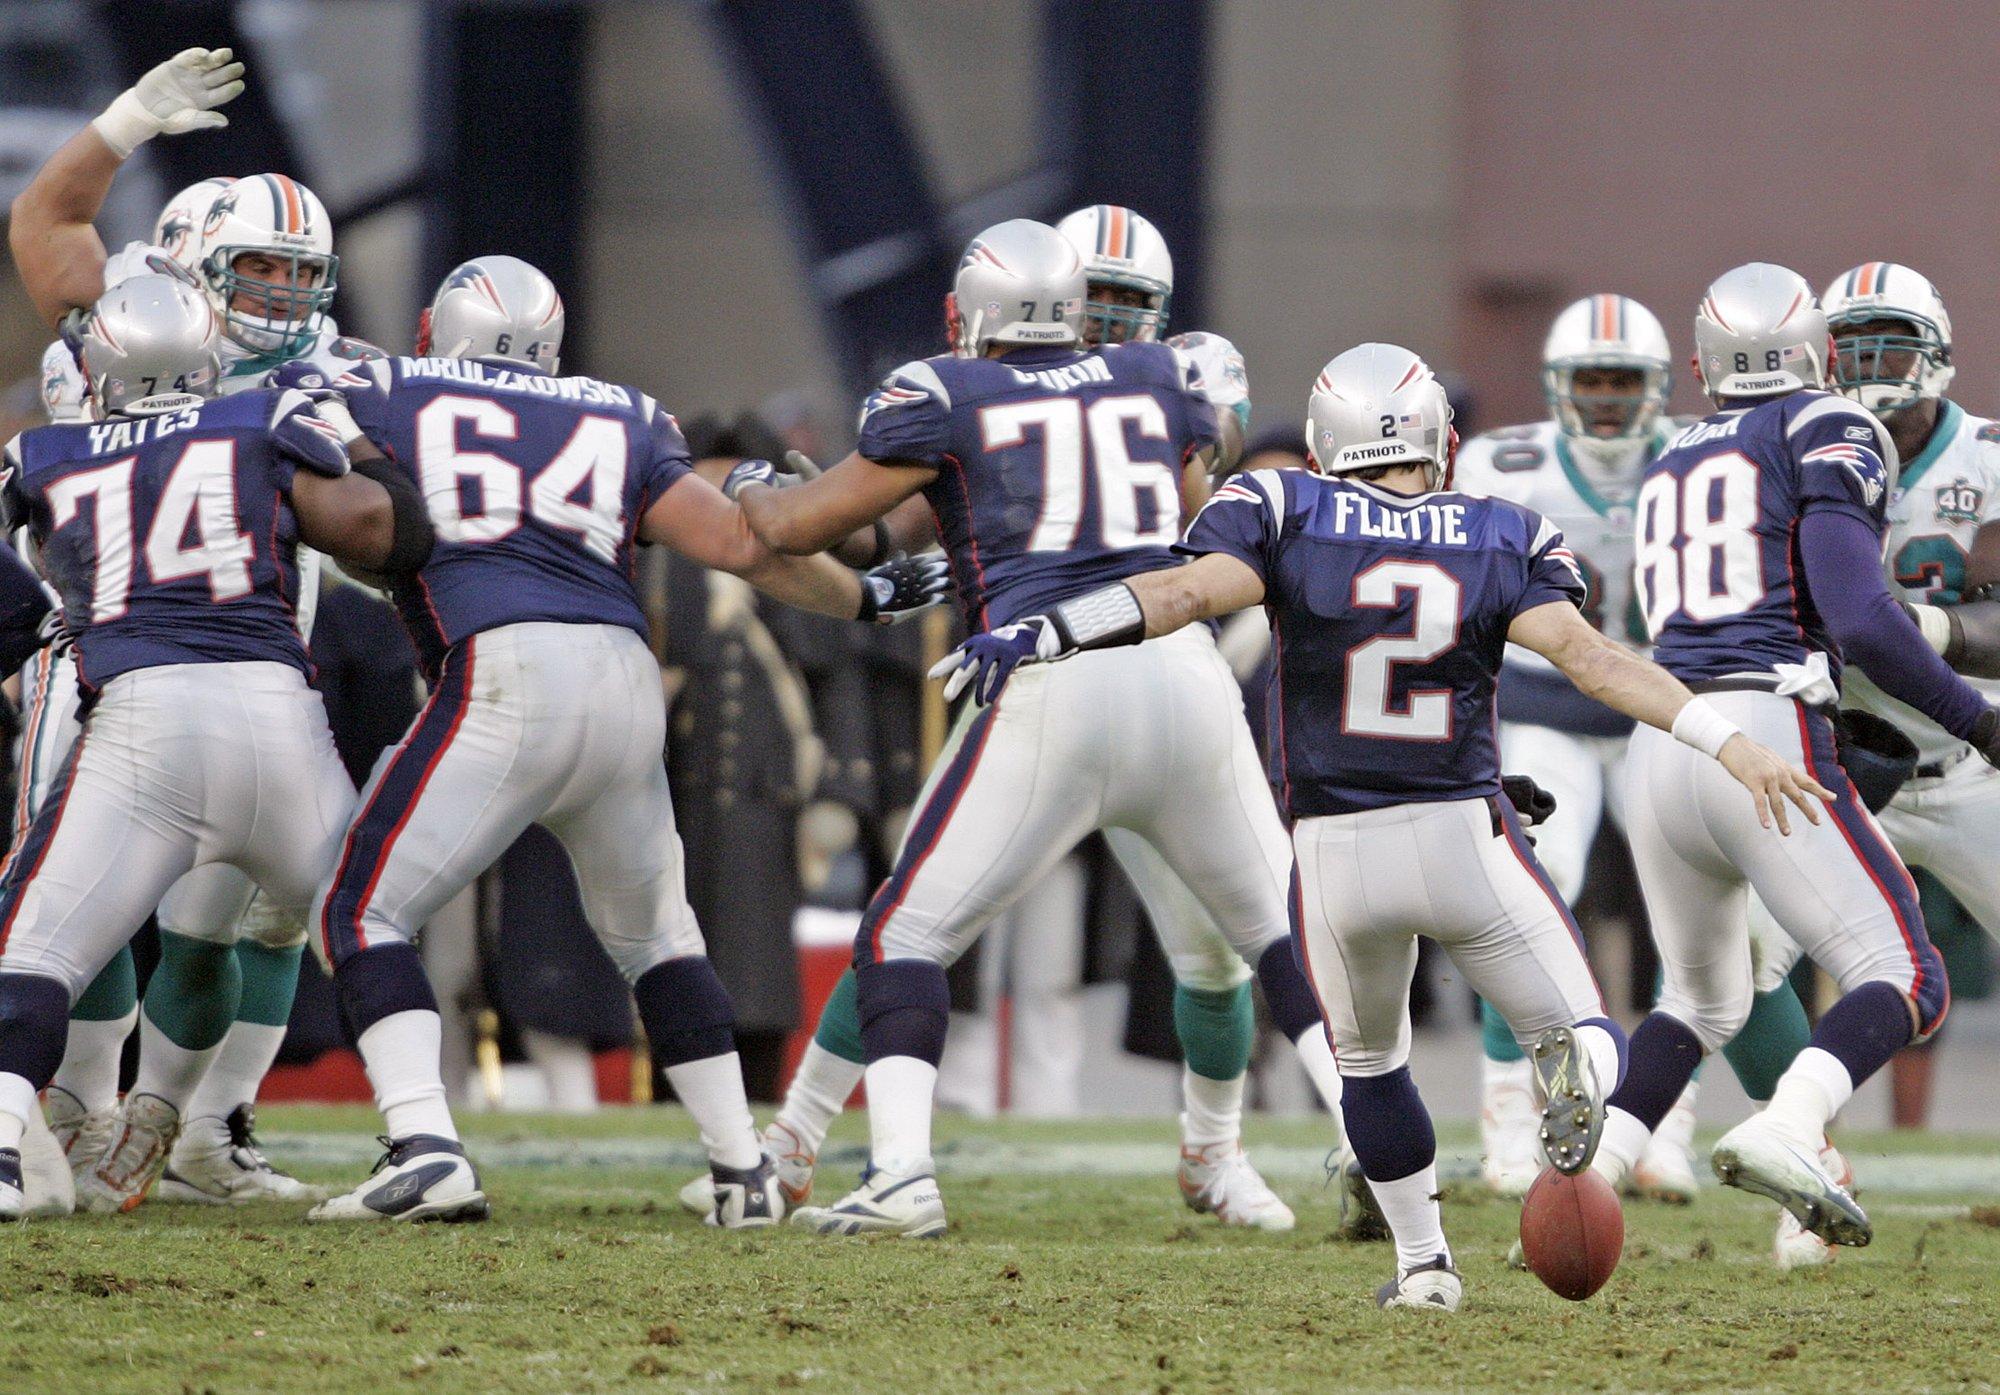 Chris Berman Talked Bill Belichick Into Giving Doug Flutie a Memorable NFL Moment